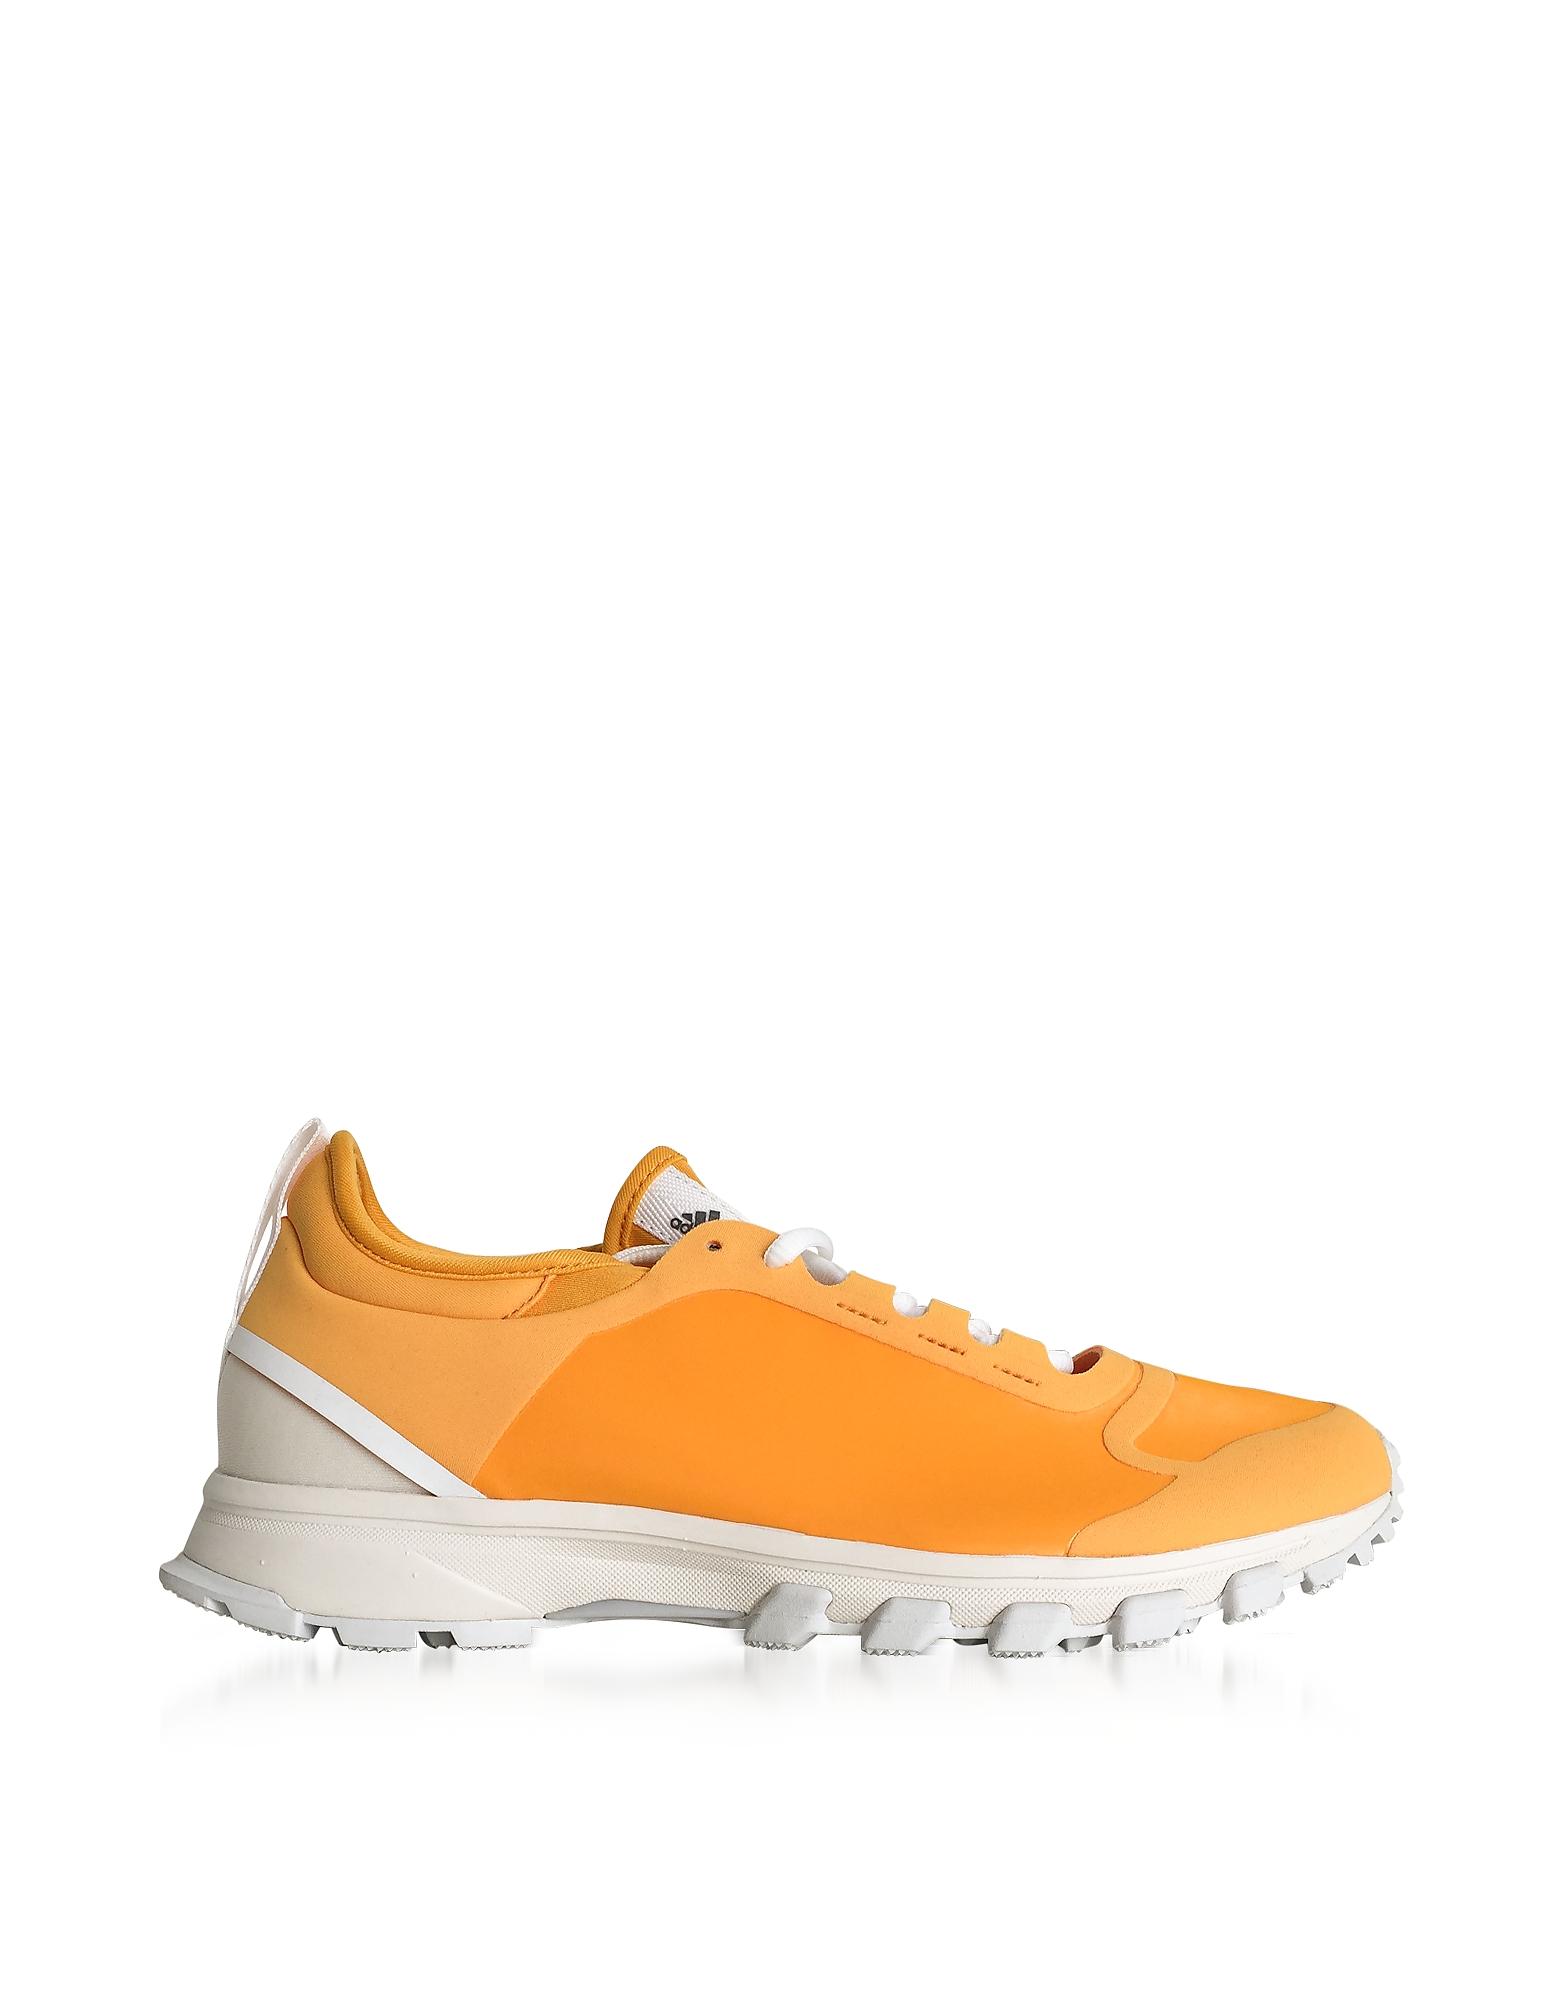 Adidas Stella McCartney Shoes, Deep Yellow and Radiant Orange Adizero XT Trainers